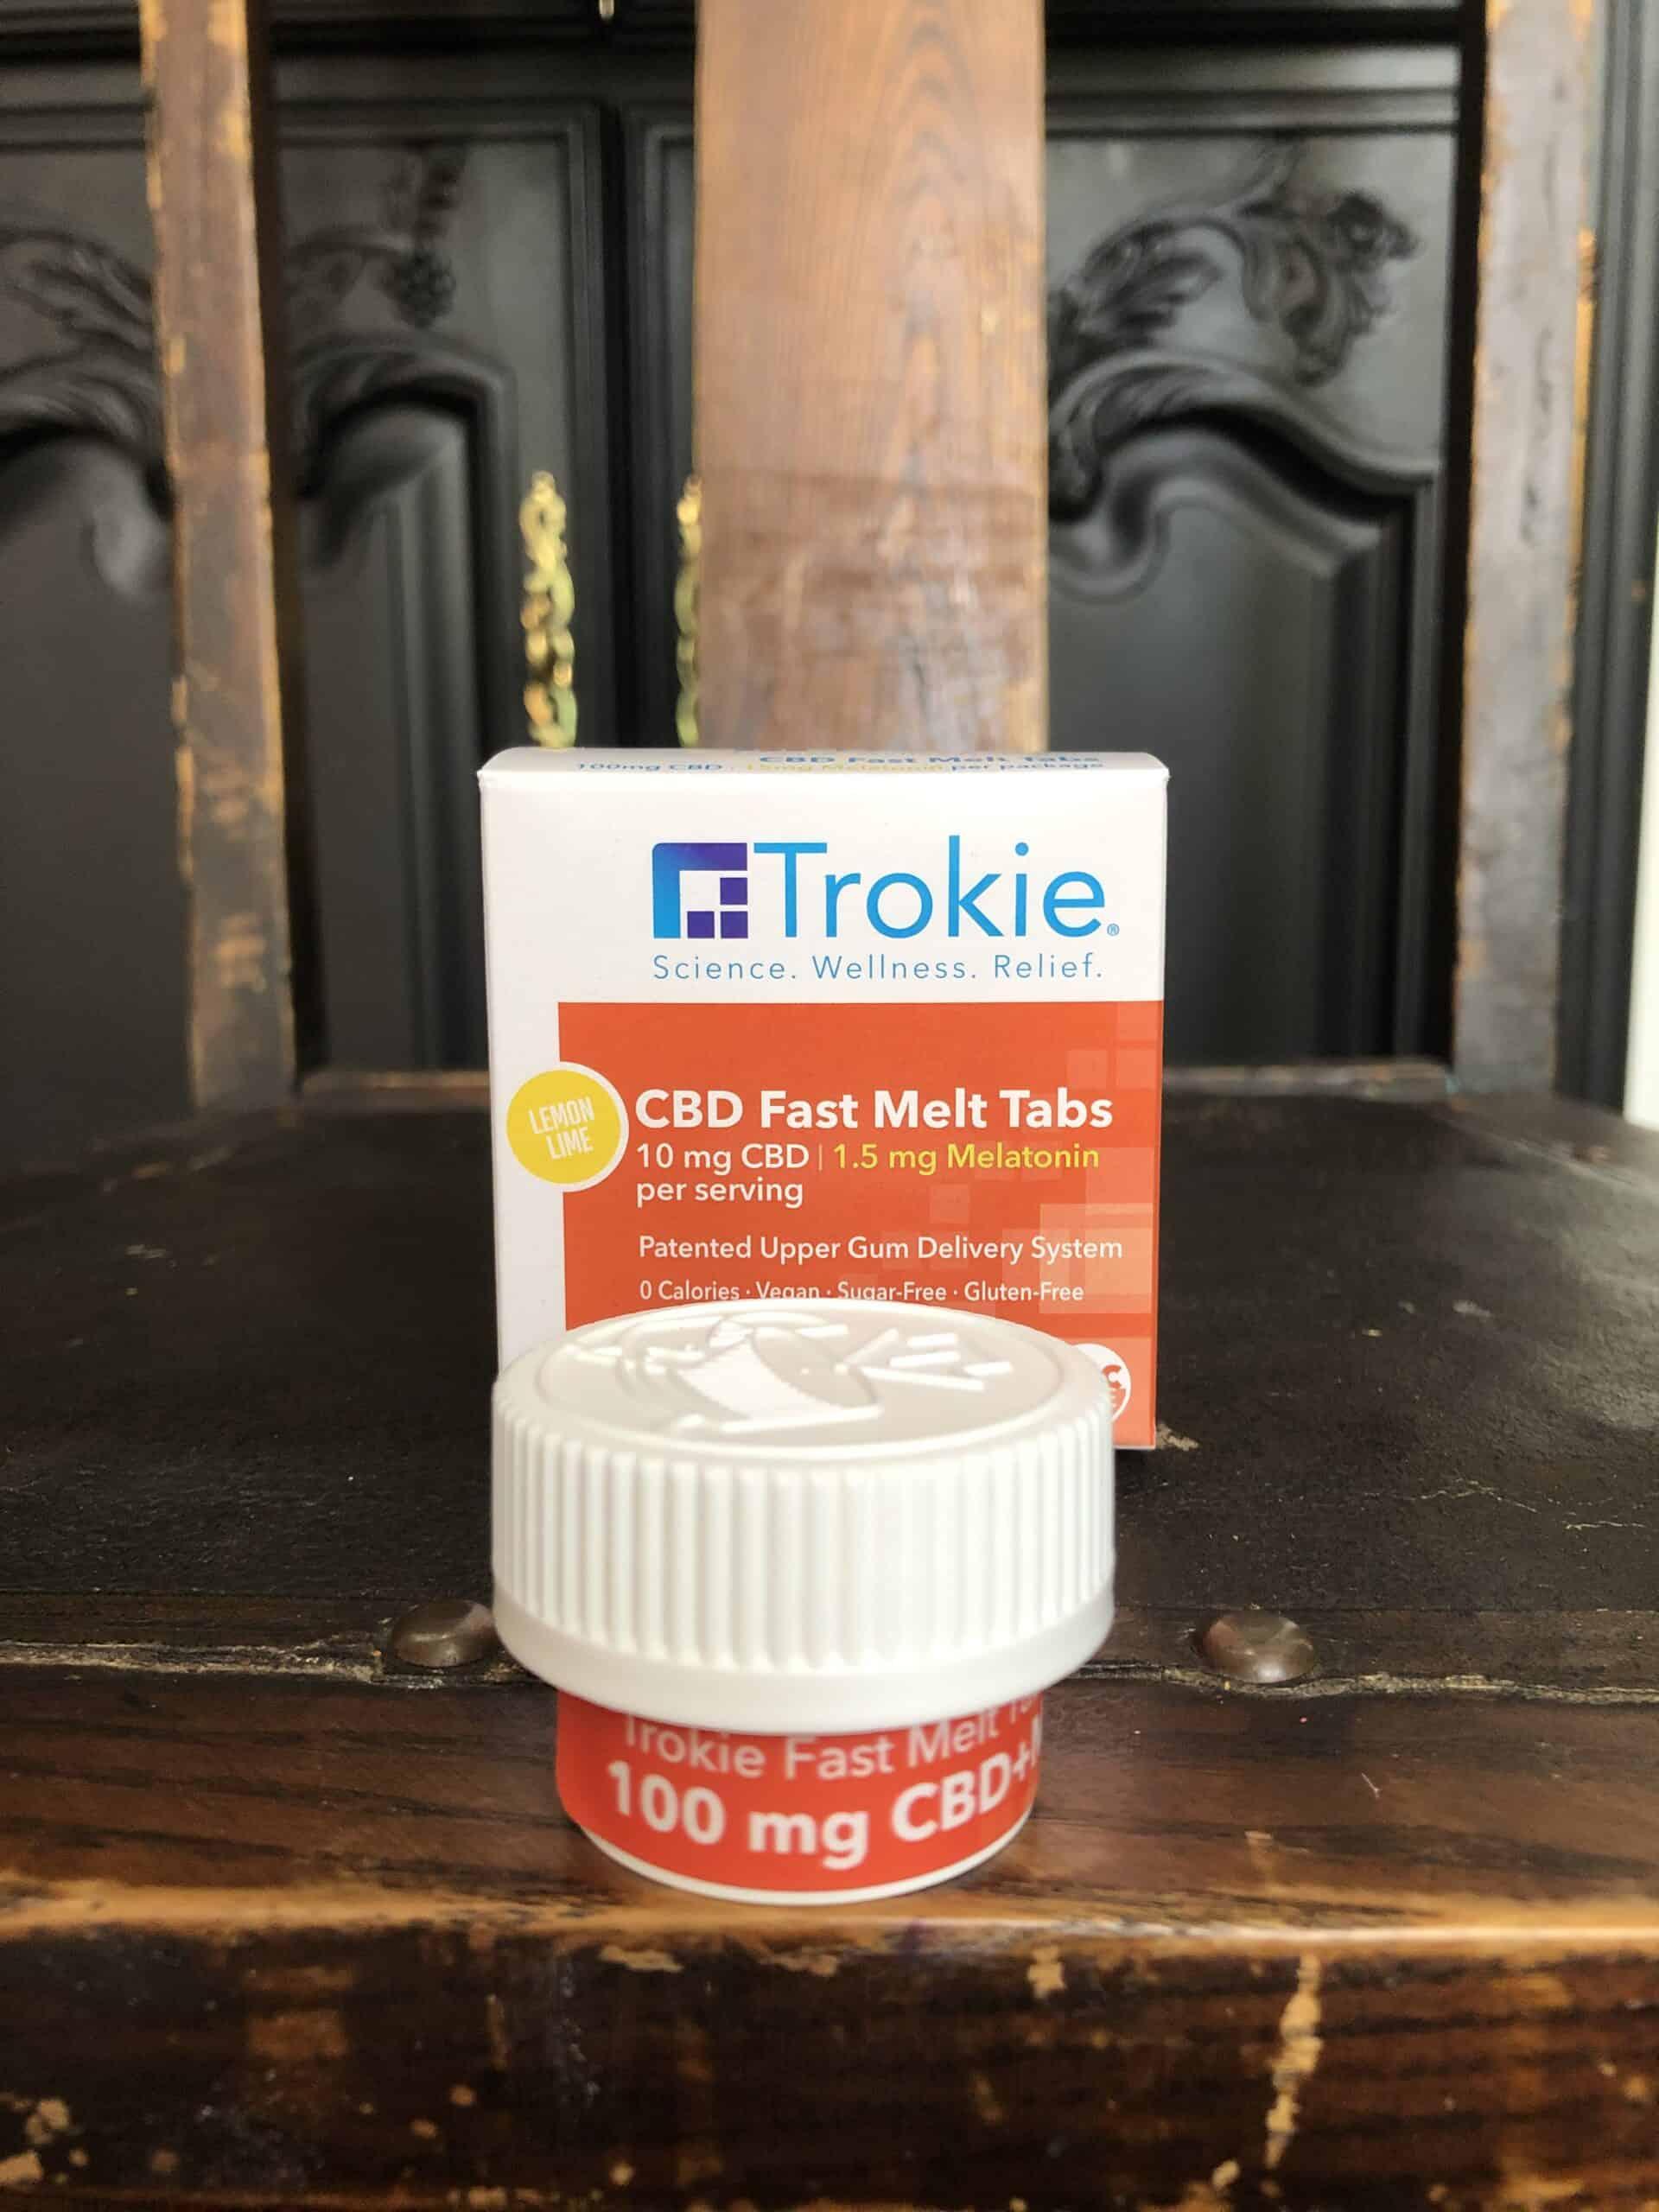 Trokie CBD Fast Melt Tabs With Melatonin Save On Cannabis Review Beauty Shot